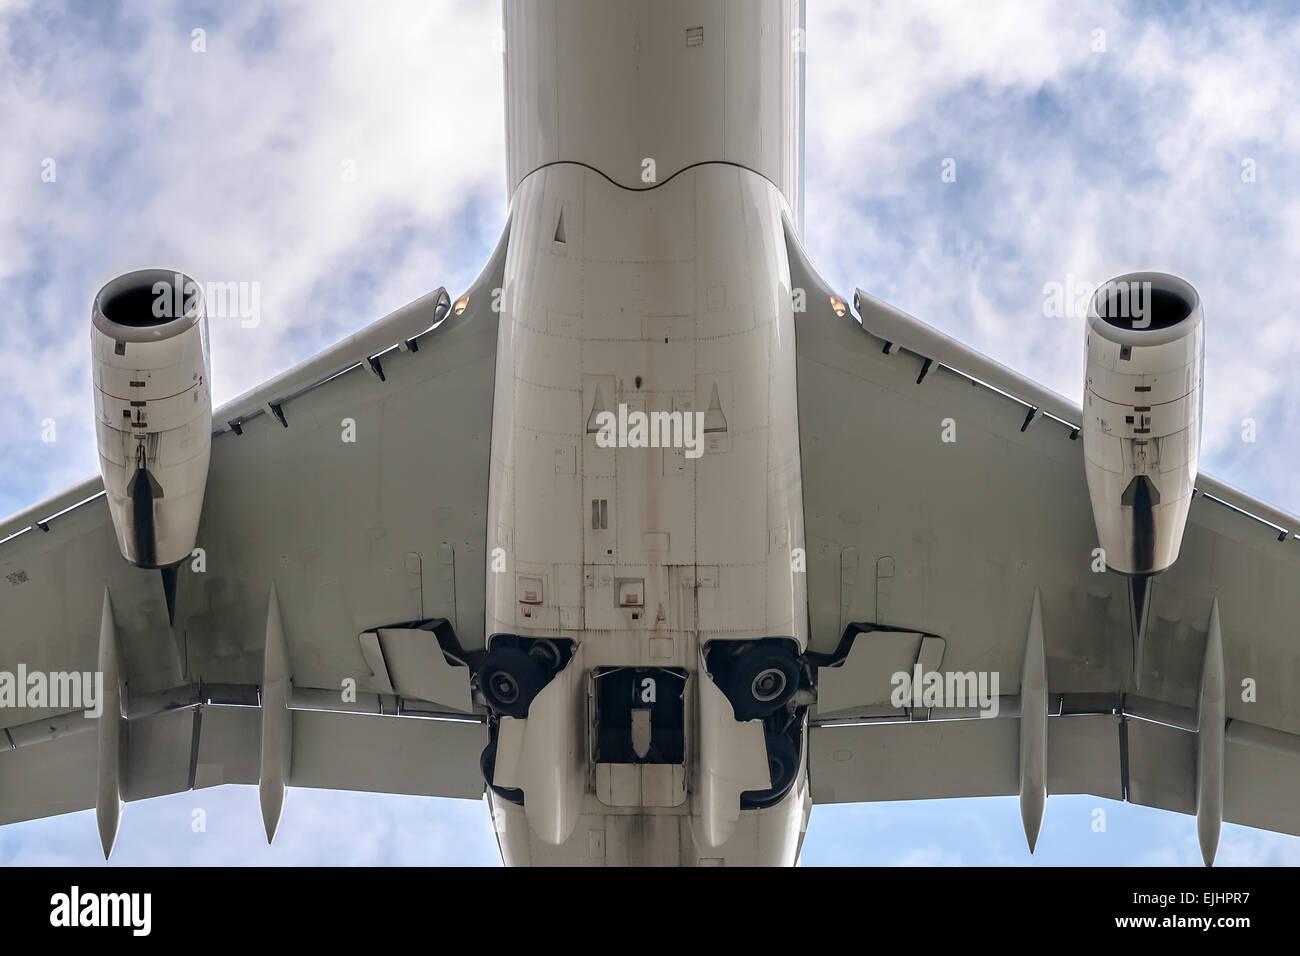 under a big jet plane taking off - Stock Image